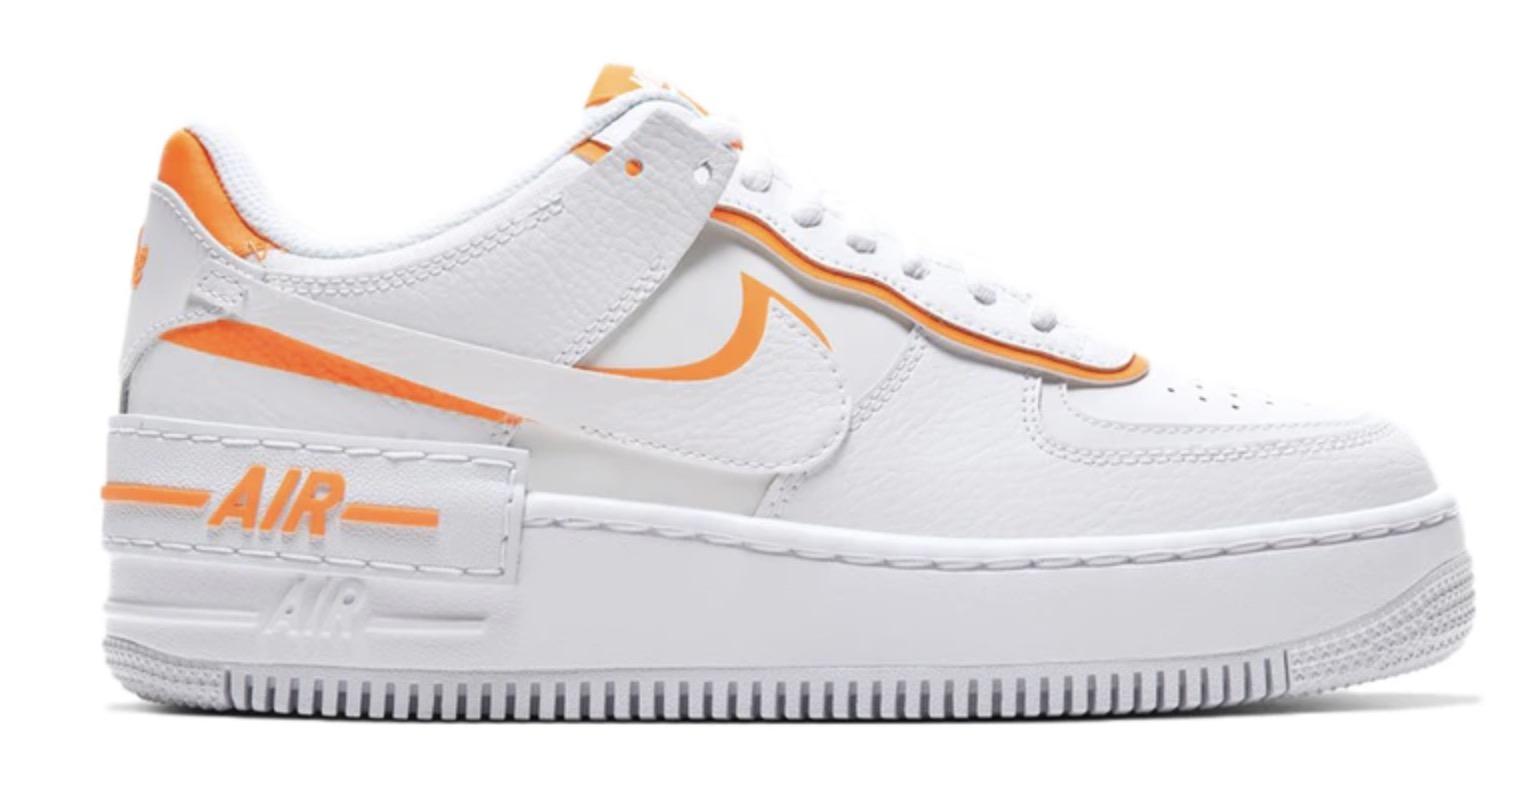 Nike Air Force 1 Shadow White Total Orange